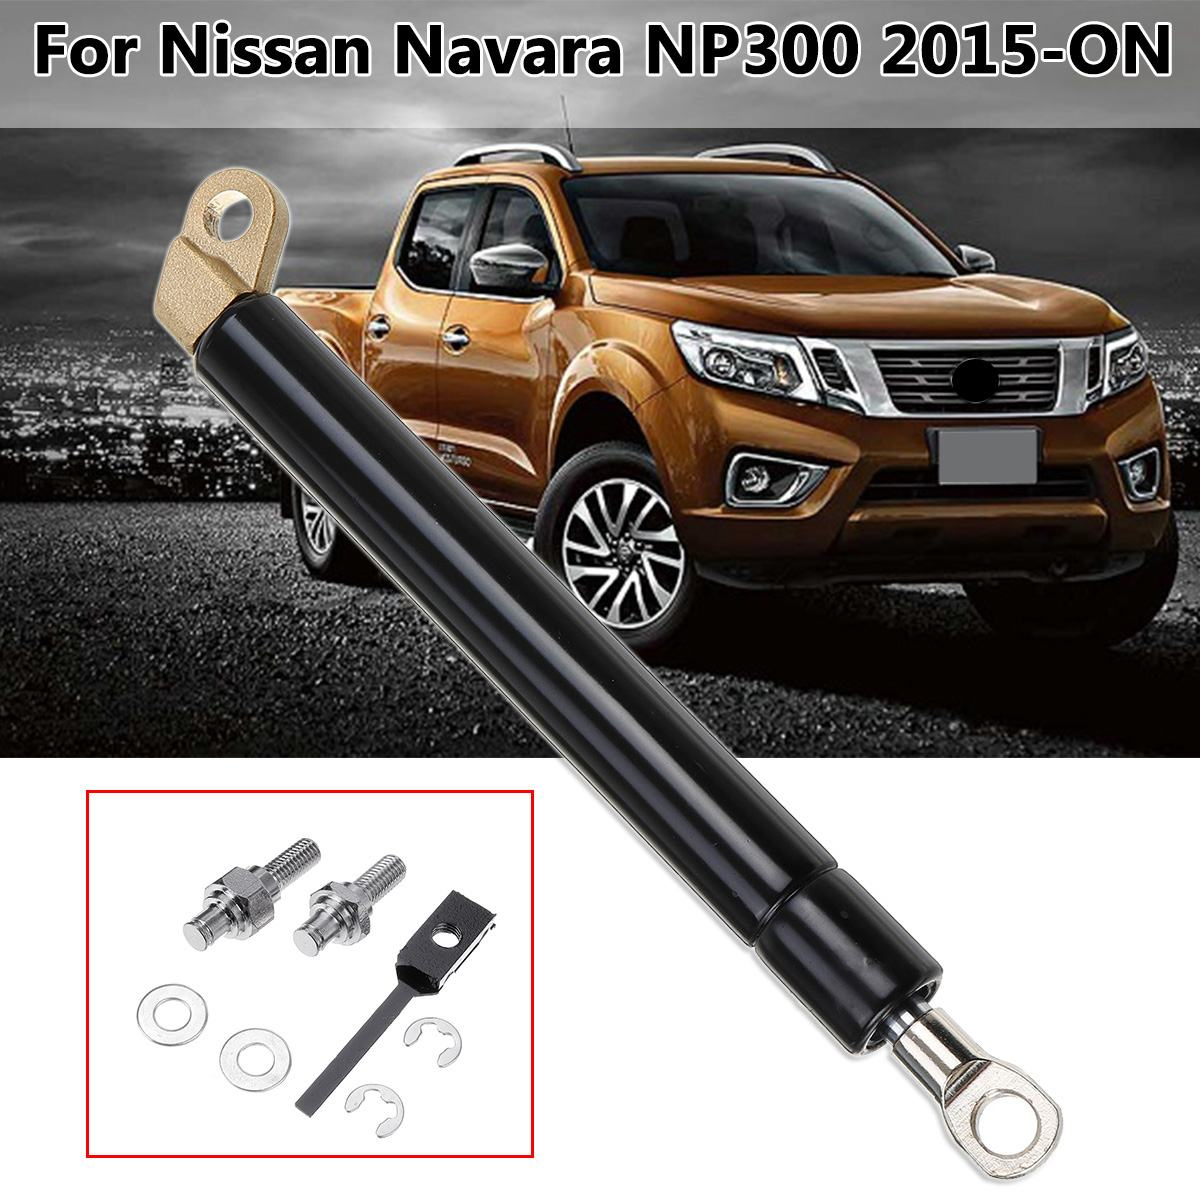 1 Pcs Traseiro Trunk Gas Strut NP300 Liftgate Bagageira Fácil Desacelerar Para Nissan Navara 2015-2019